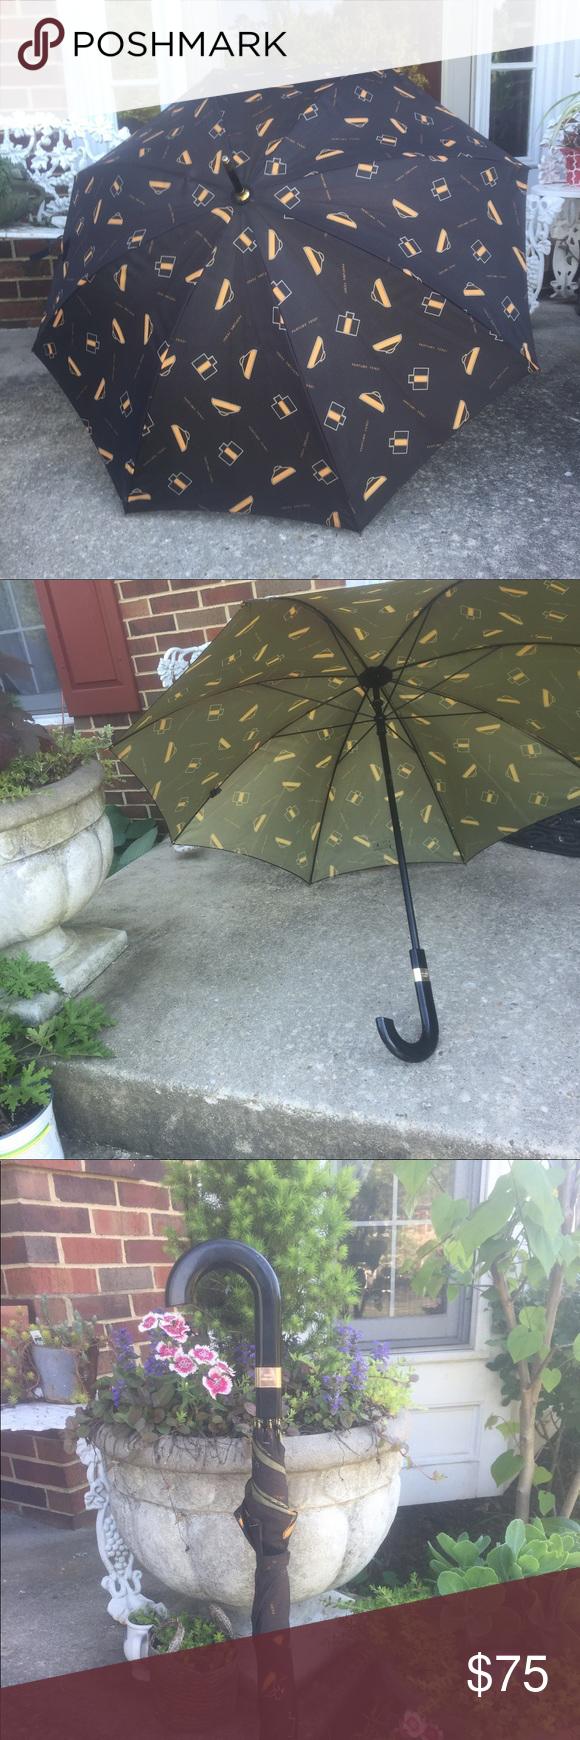 Vintage Fendi Parfum Umbrella Vintage Fendi Parfum Umbrella Makes A Nice Walking Cane Umbrella Full Size 35 Curved Wooden Handl Fendi Vintage Wooden Handles